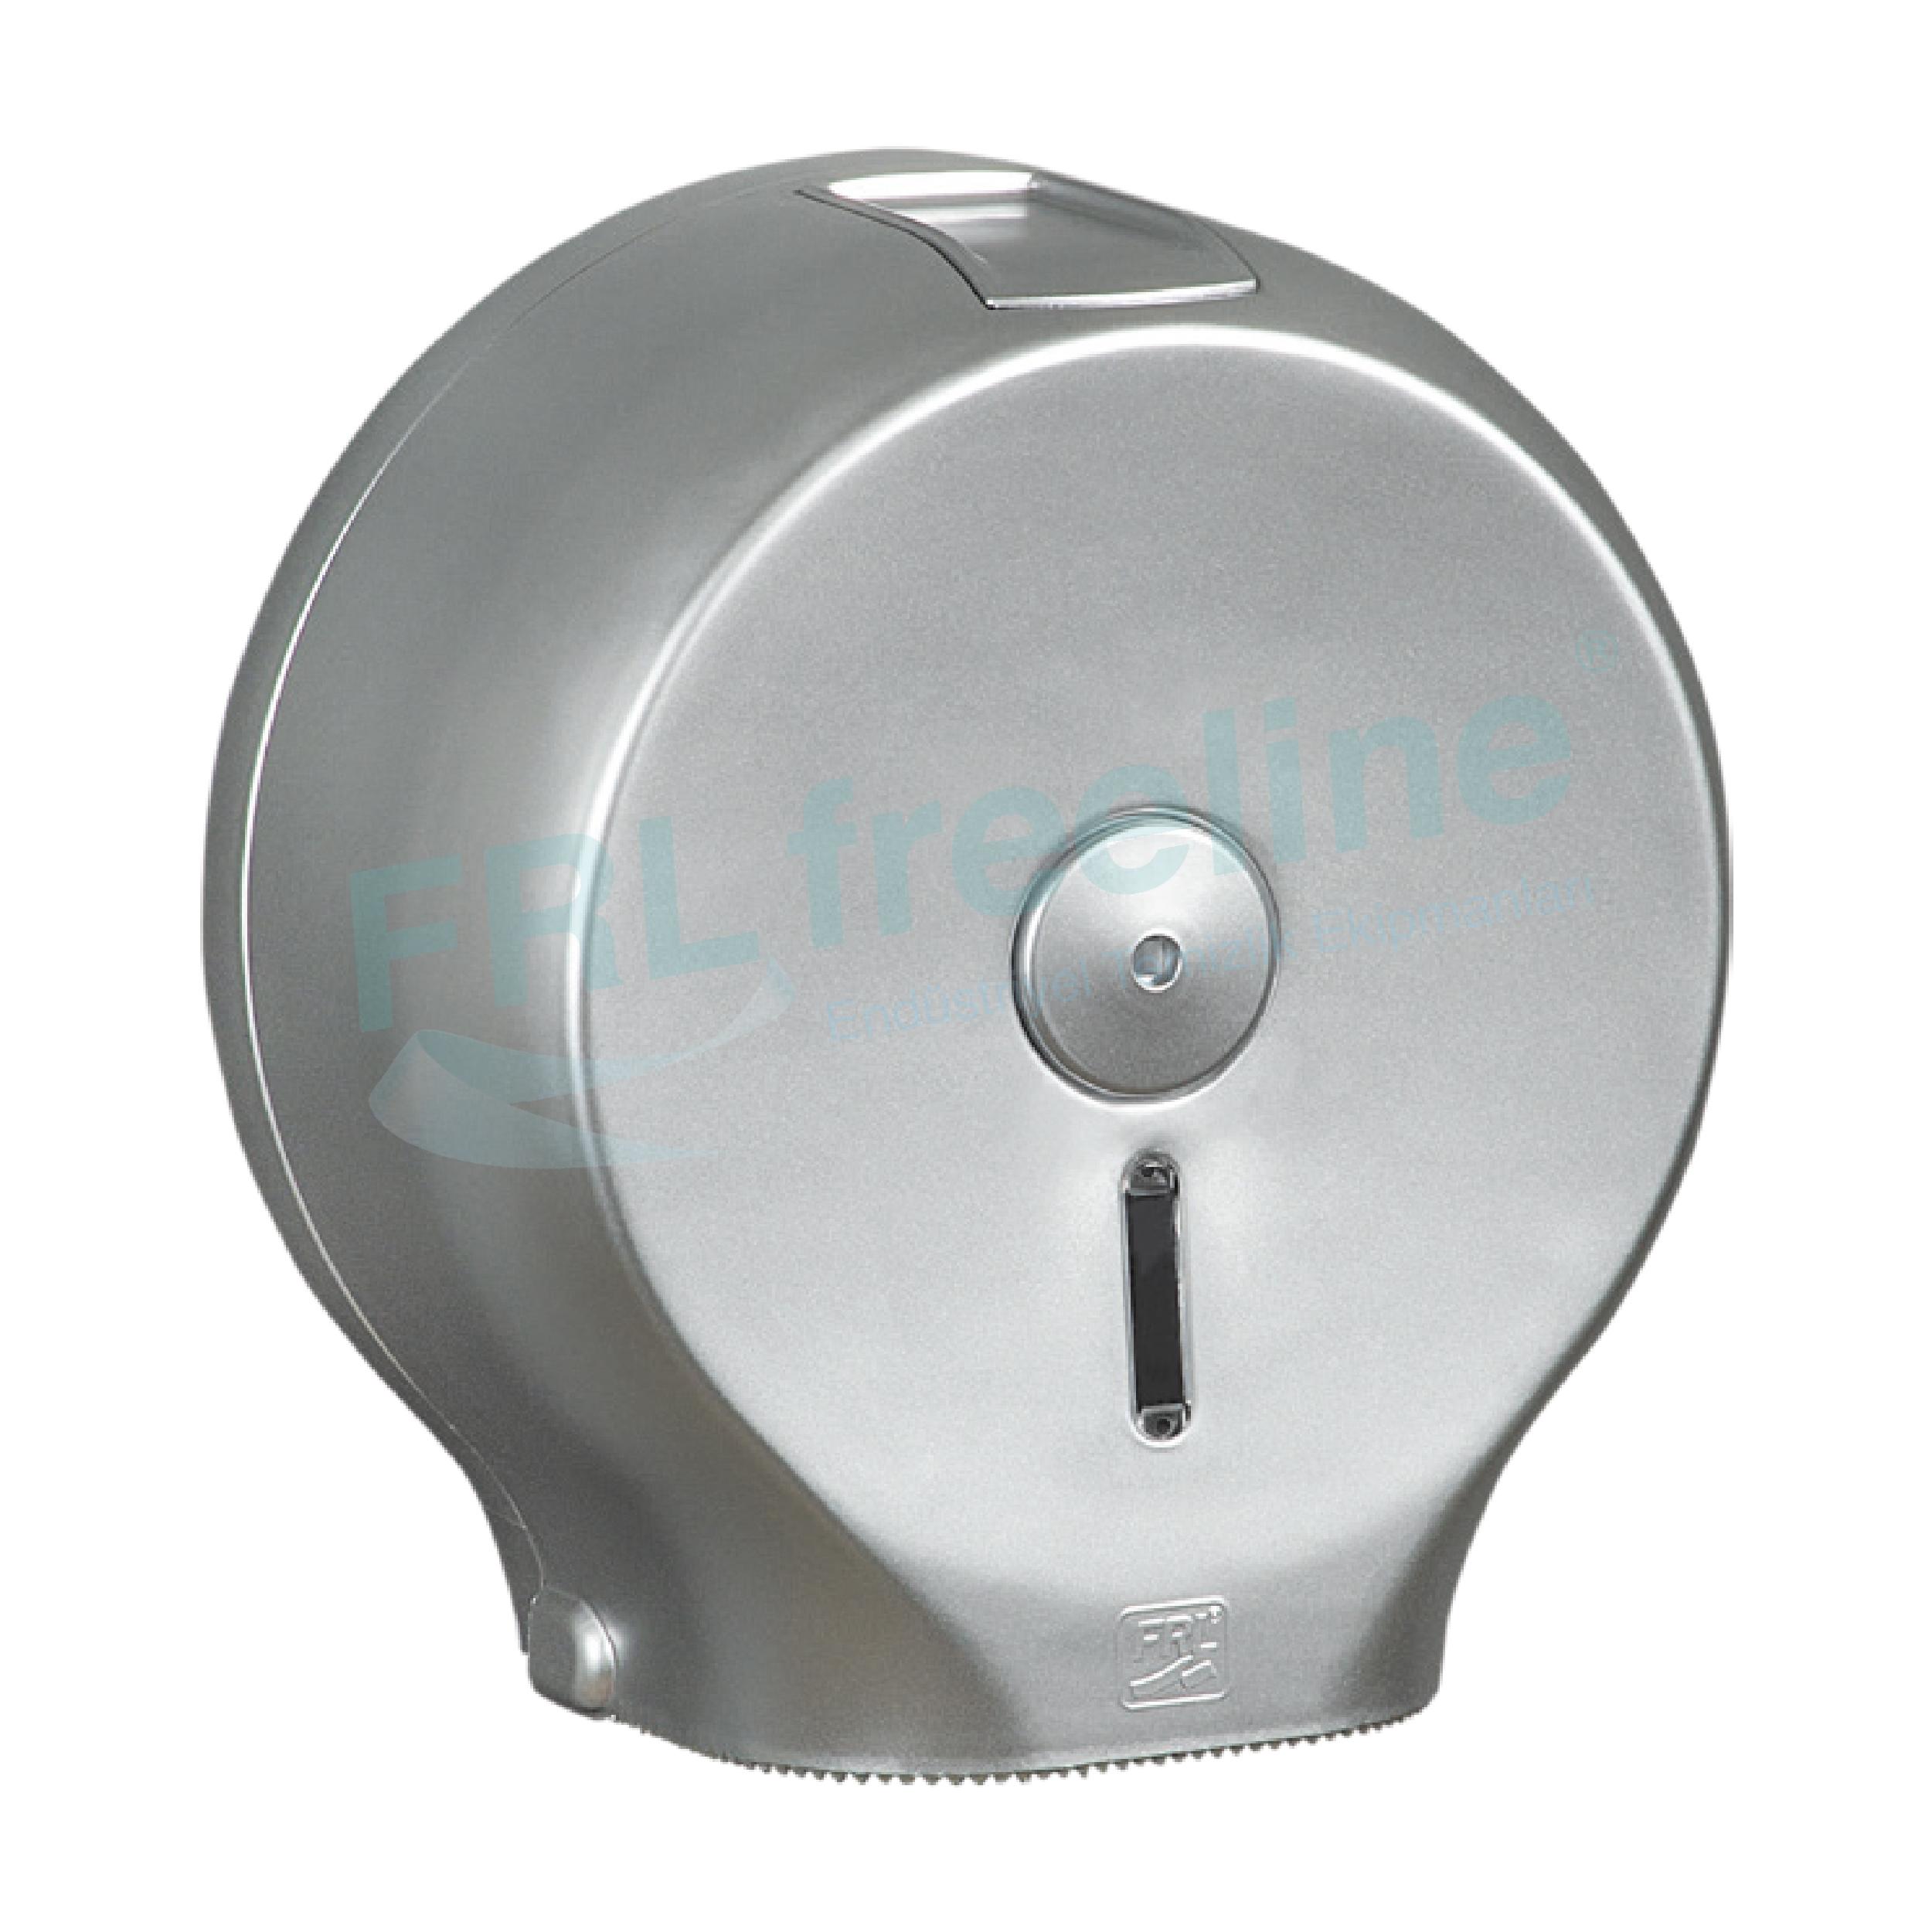 Wcroll Tuvalet Kağıt Dispenseri(Jumbo) Gümüş